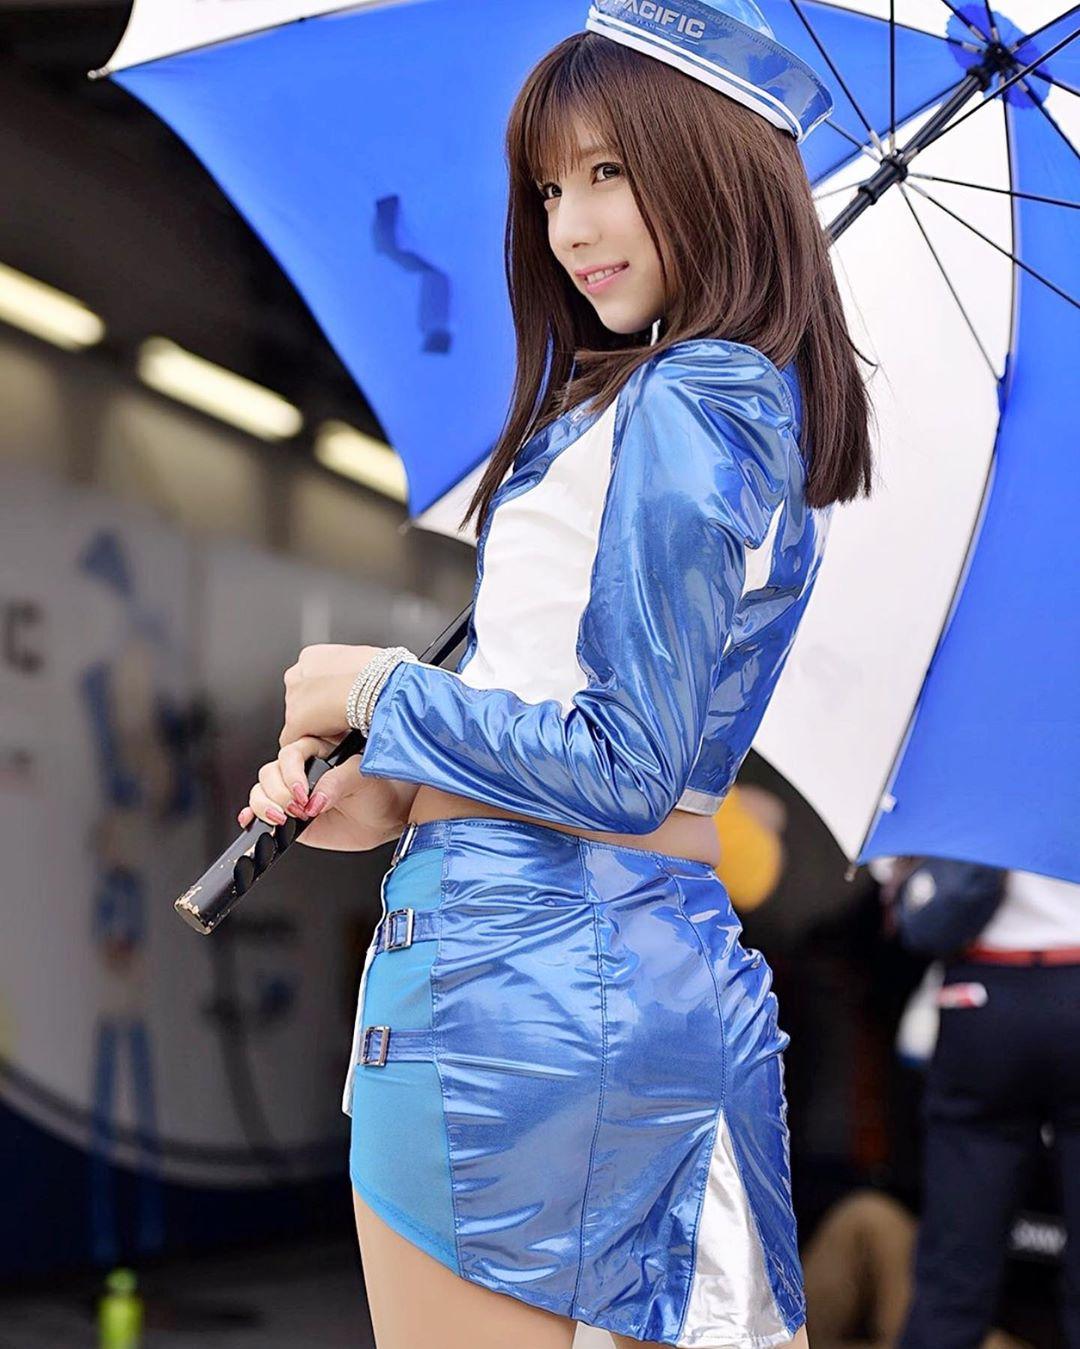 1Sr5rXHk o - IG正妹—夏本あさみ Asami Natsumoto